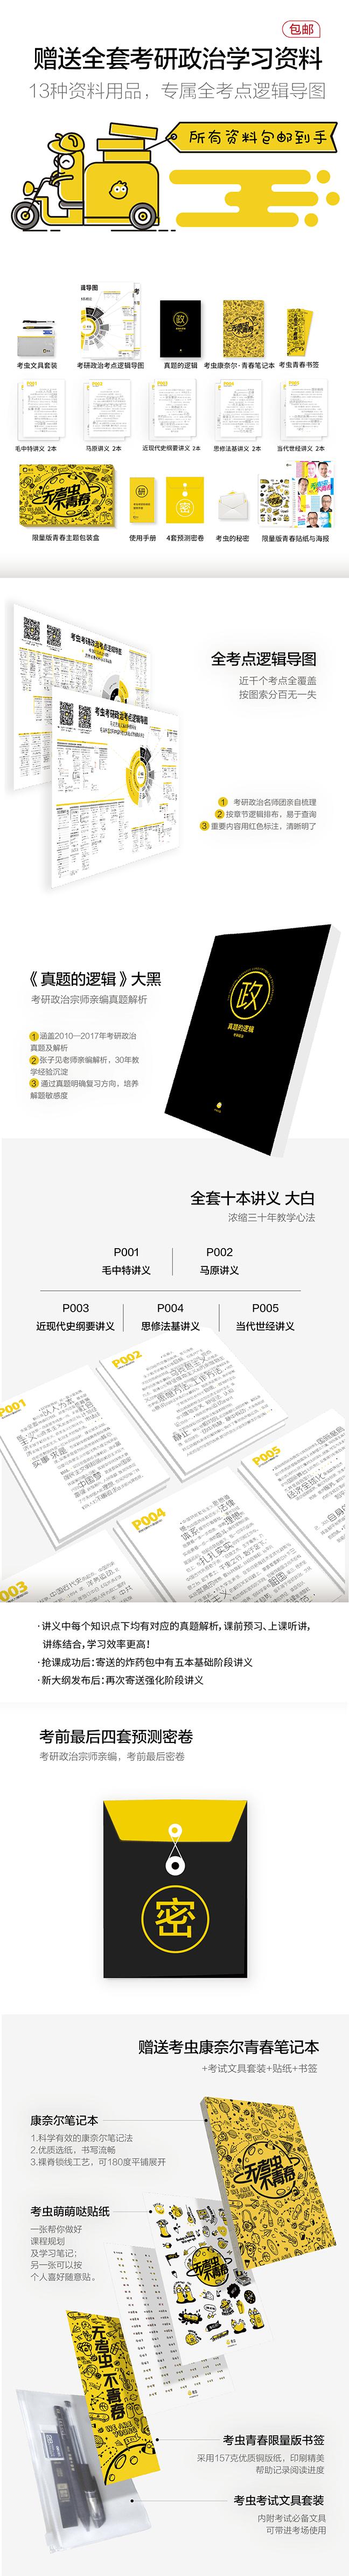 考研18政治-02.png